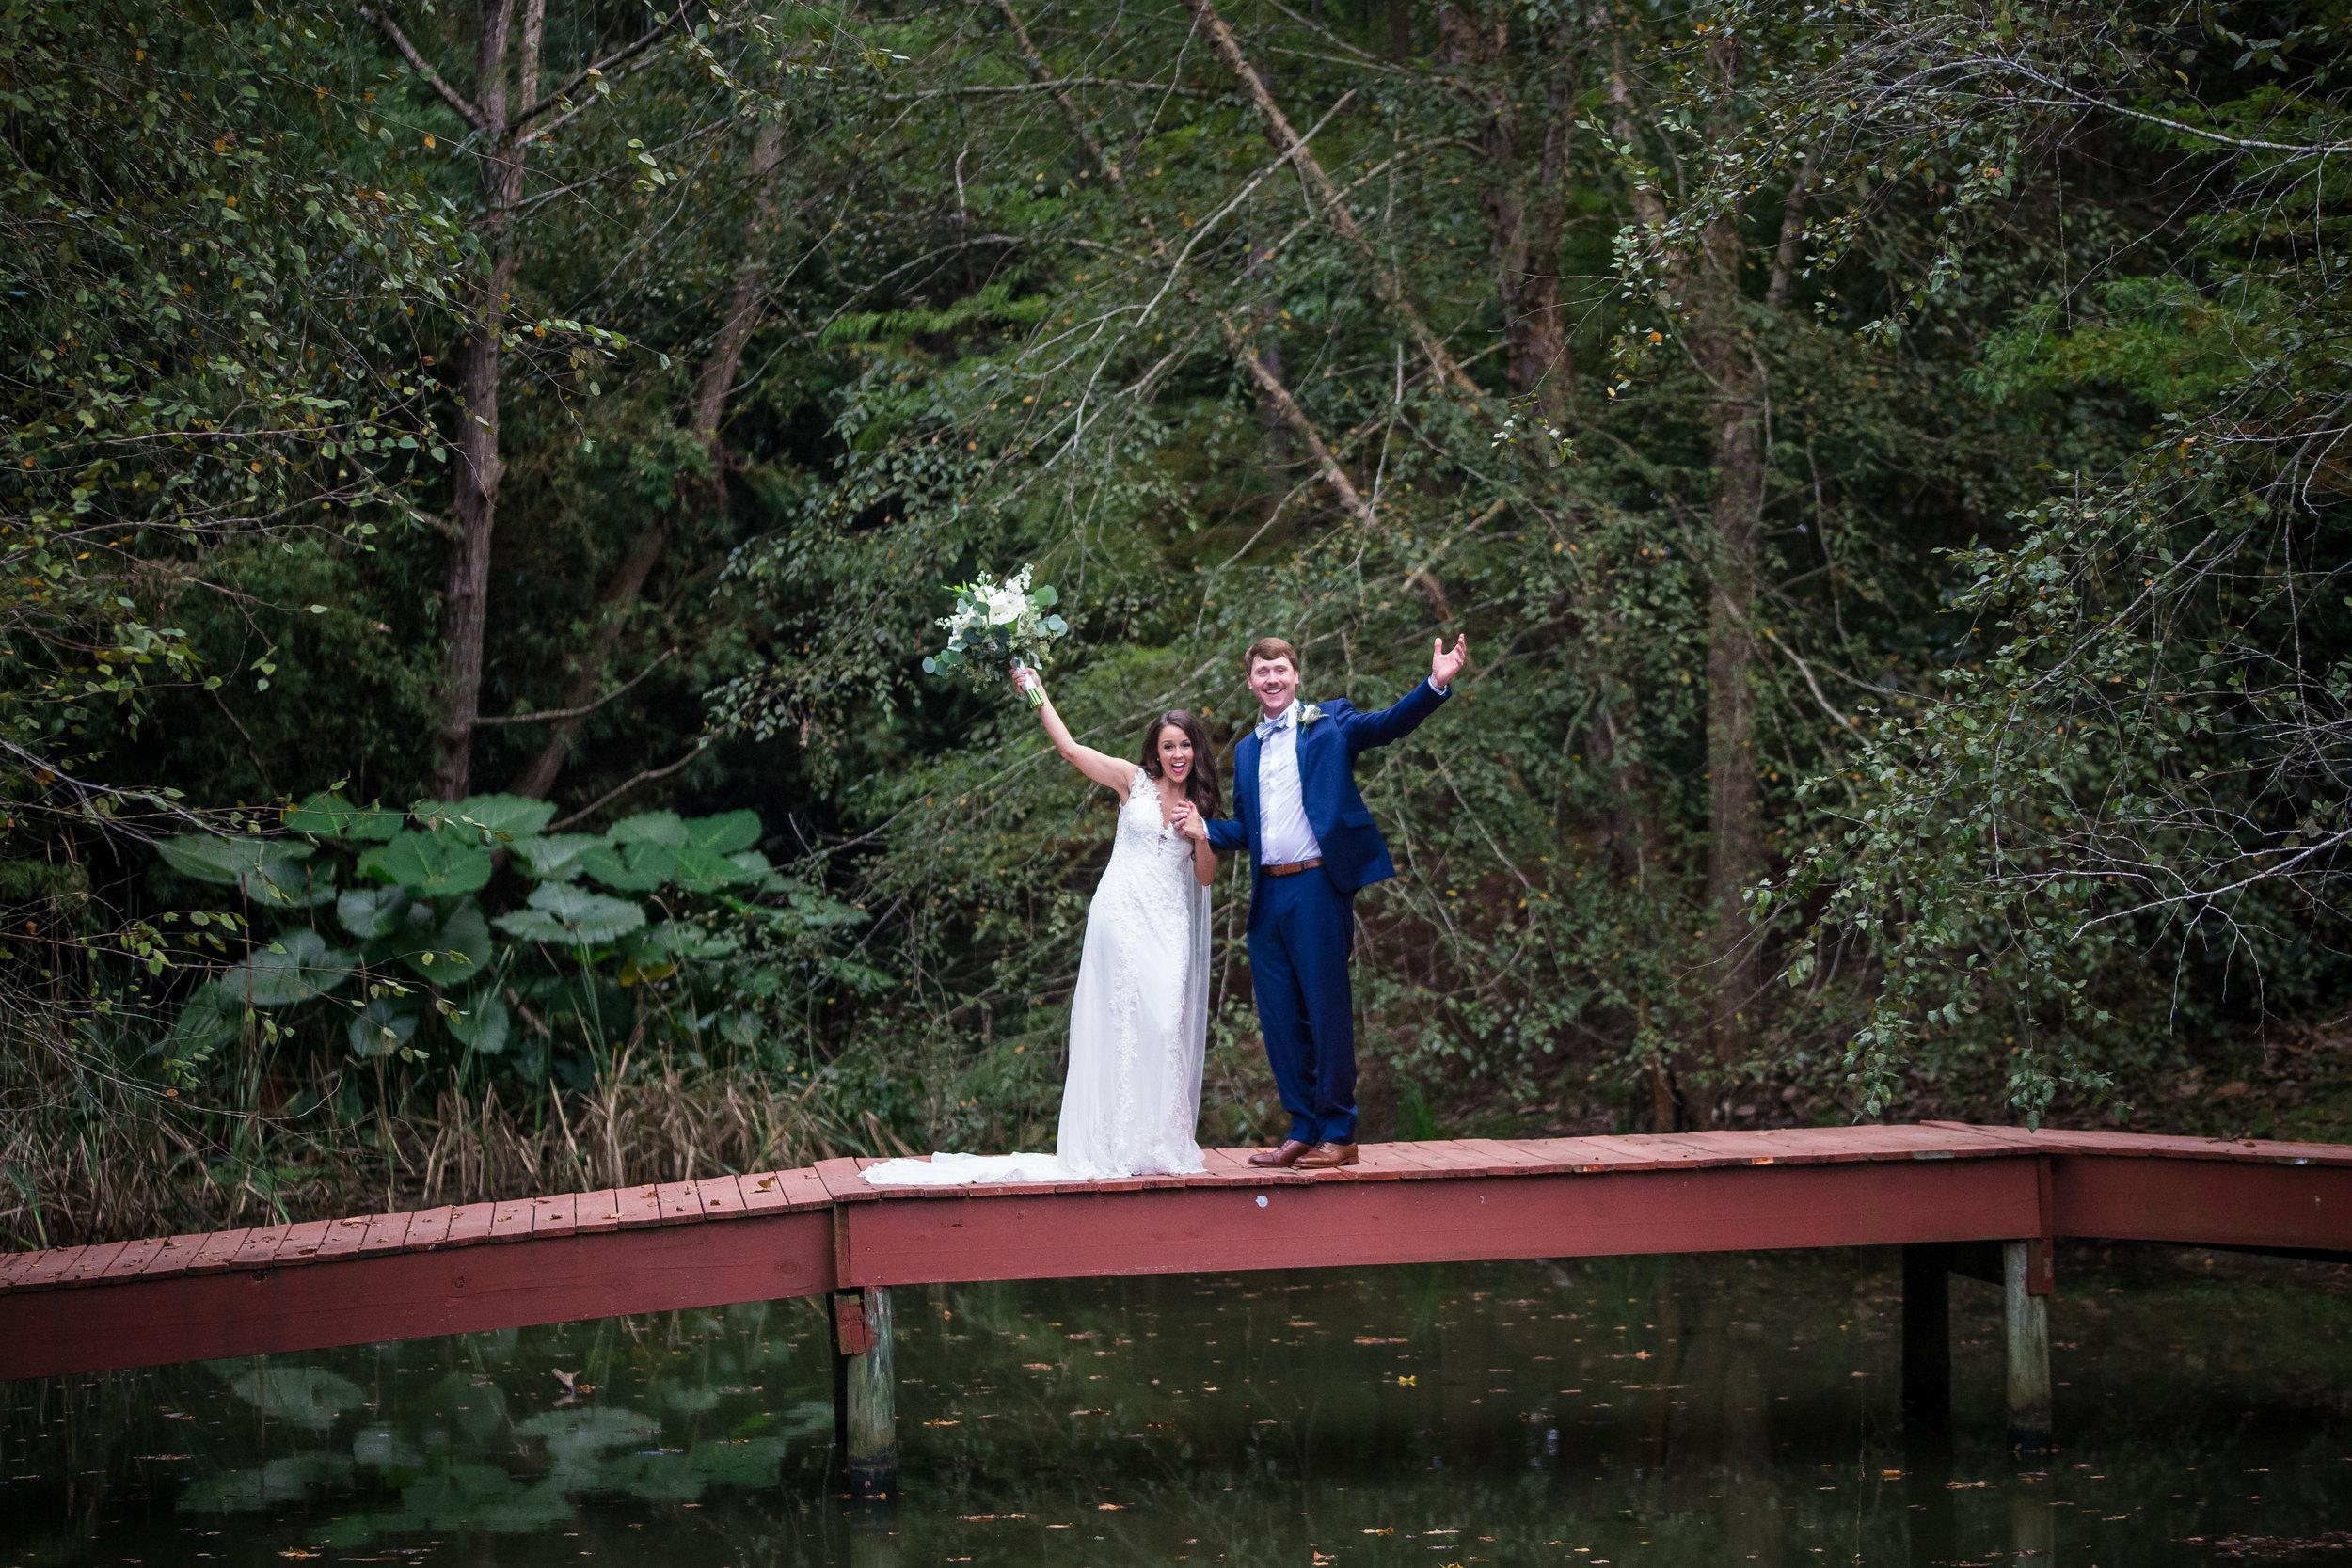 Bella-Sera-Gardens-Alabama-Mobile-Photography-Pensacola-Navarre-Fairhope-Wedding-27.jpg